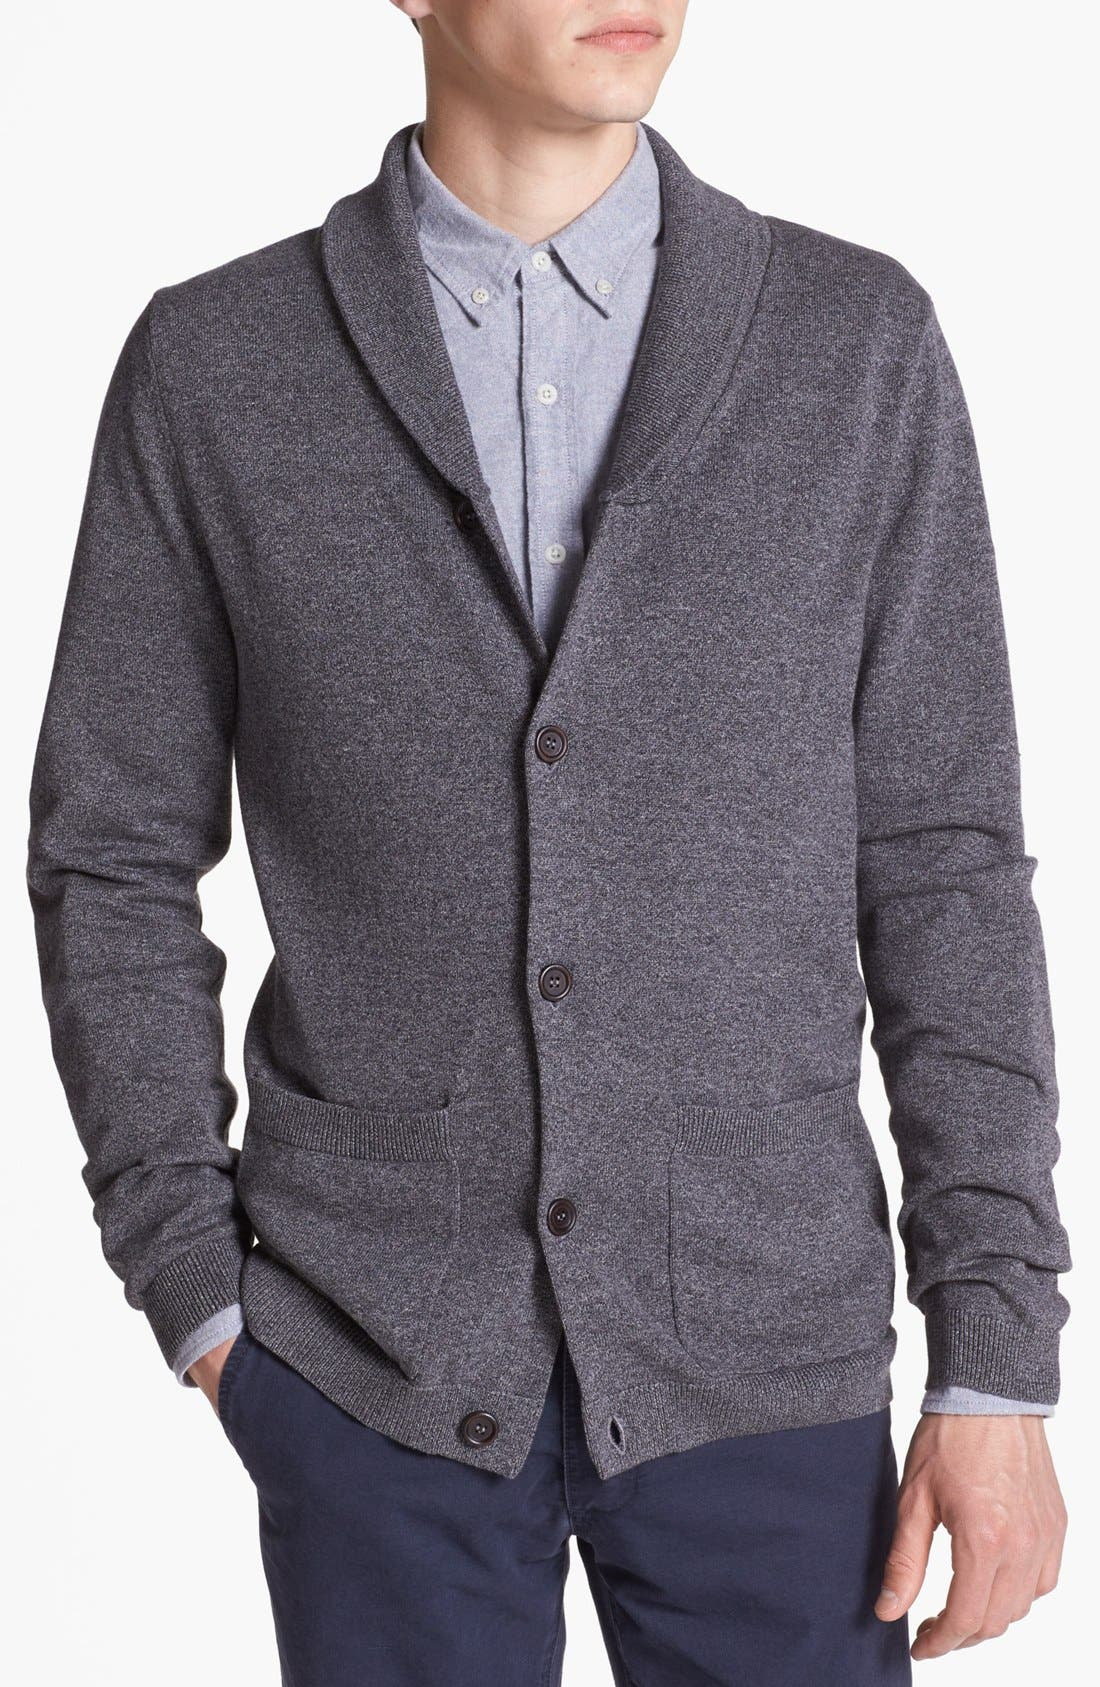 Alternate Image 1 Selected - Topman Shawl Collar Cardigan